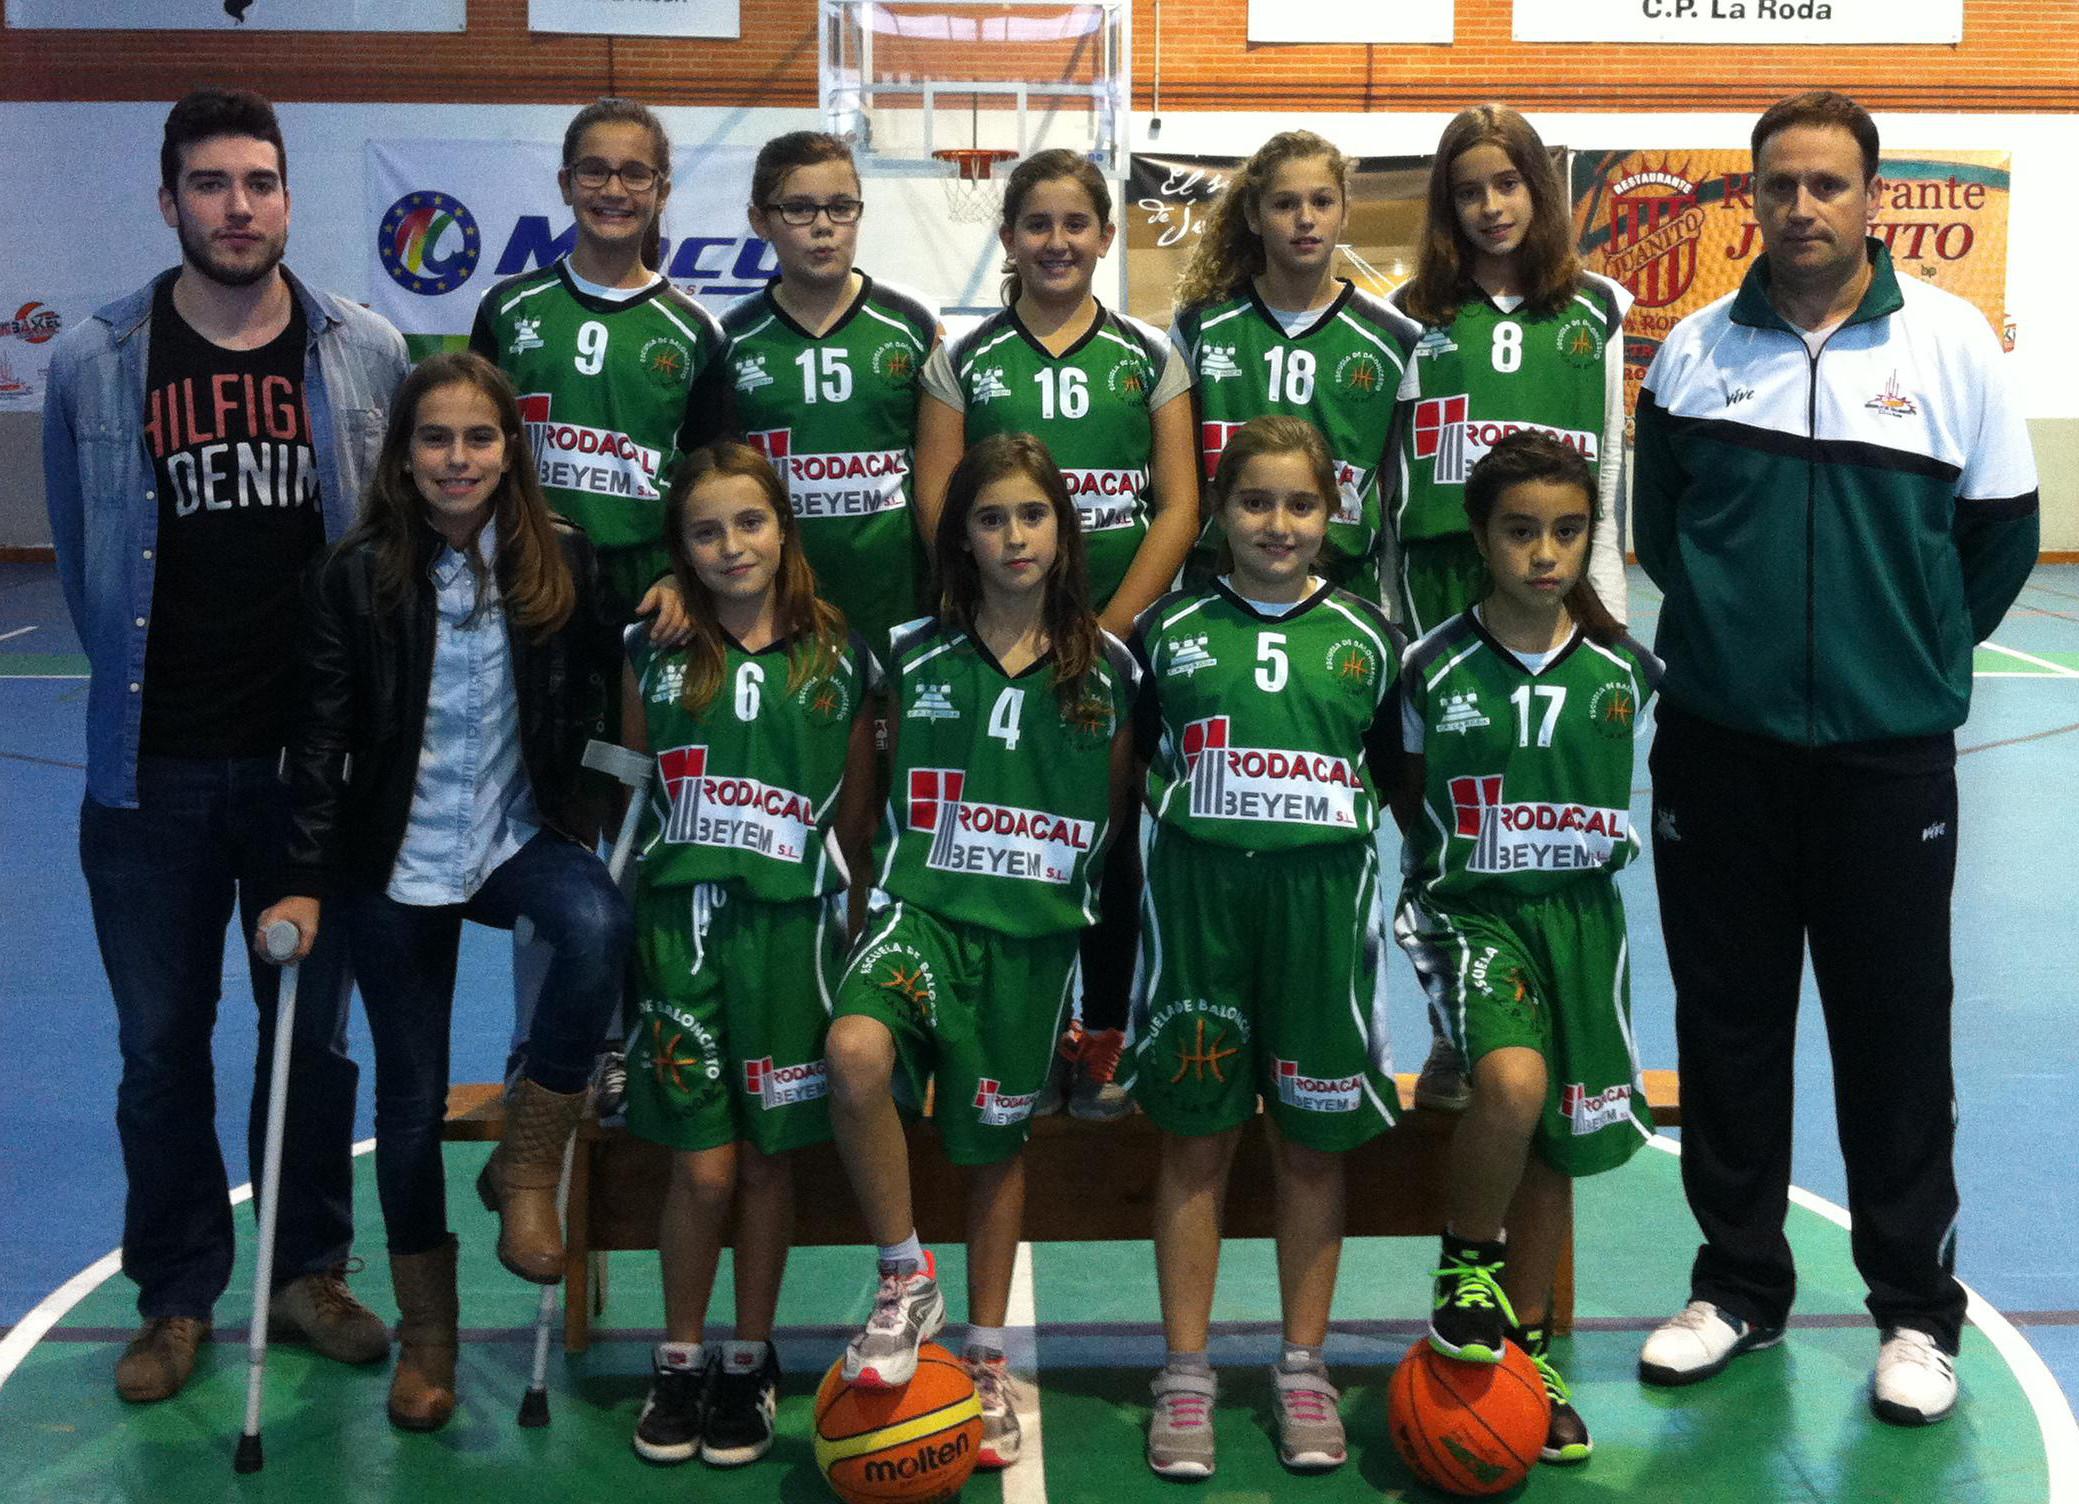 Equipo de Minibasket Rodacal Beyem CP La Roda